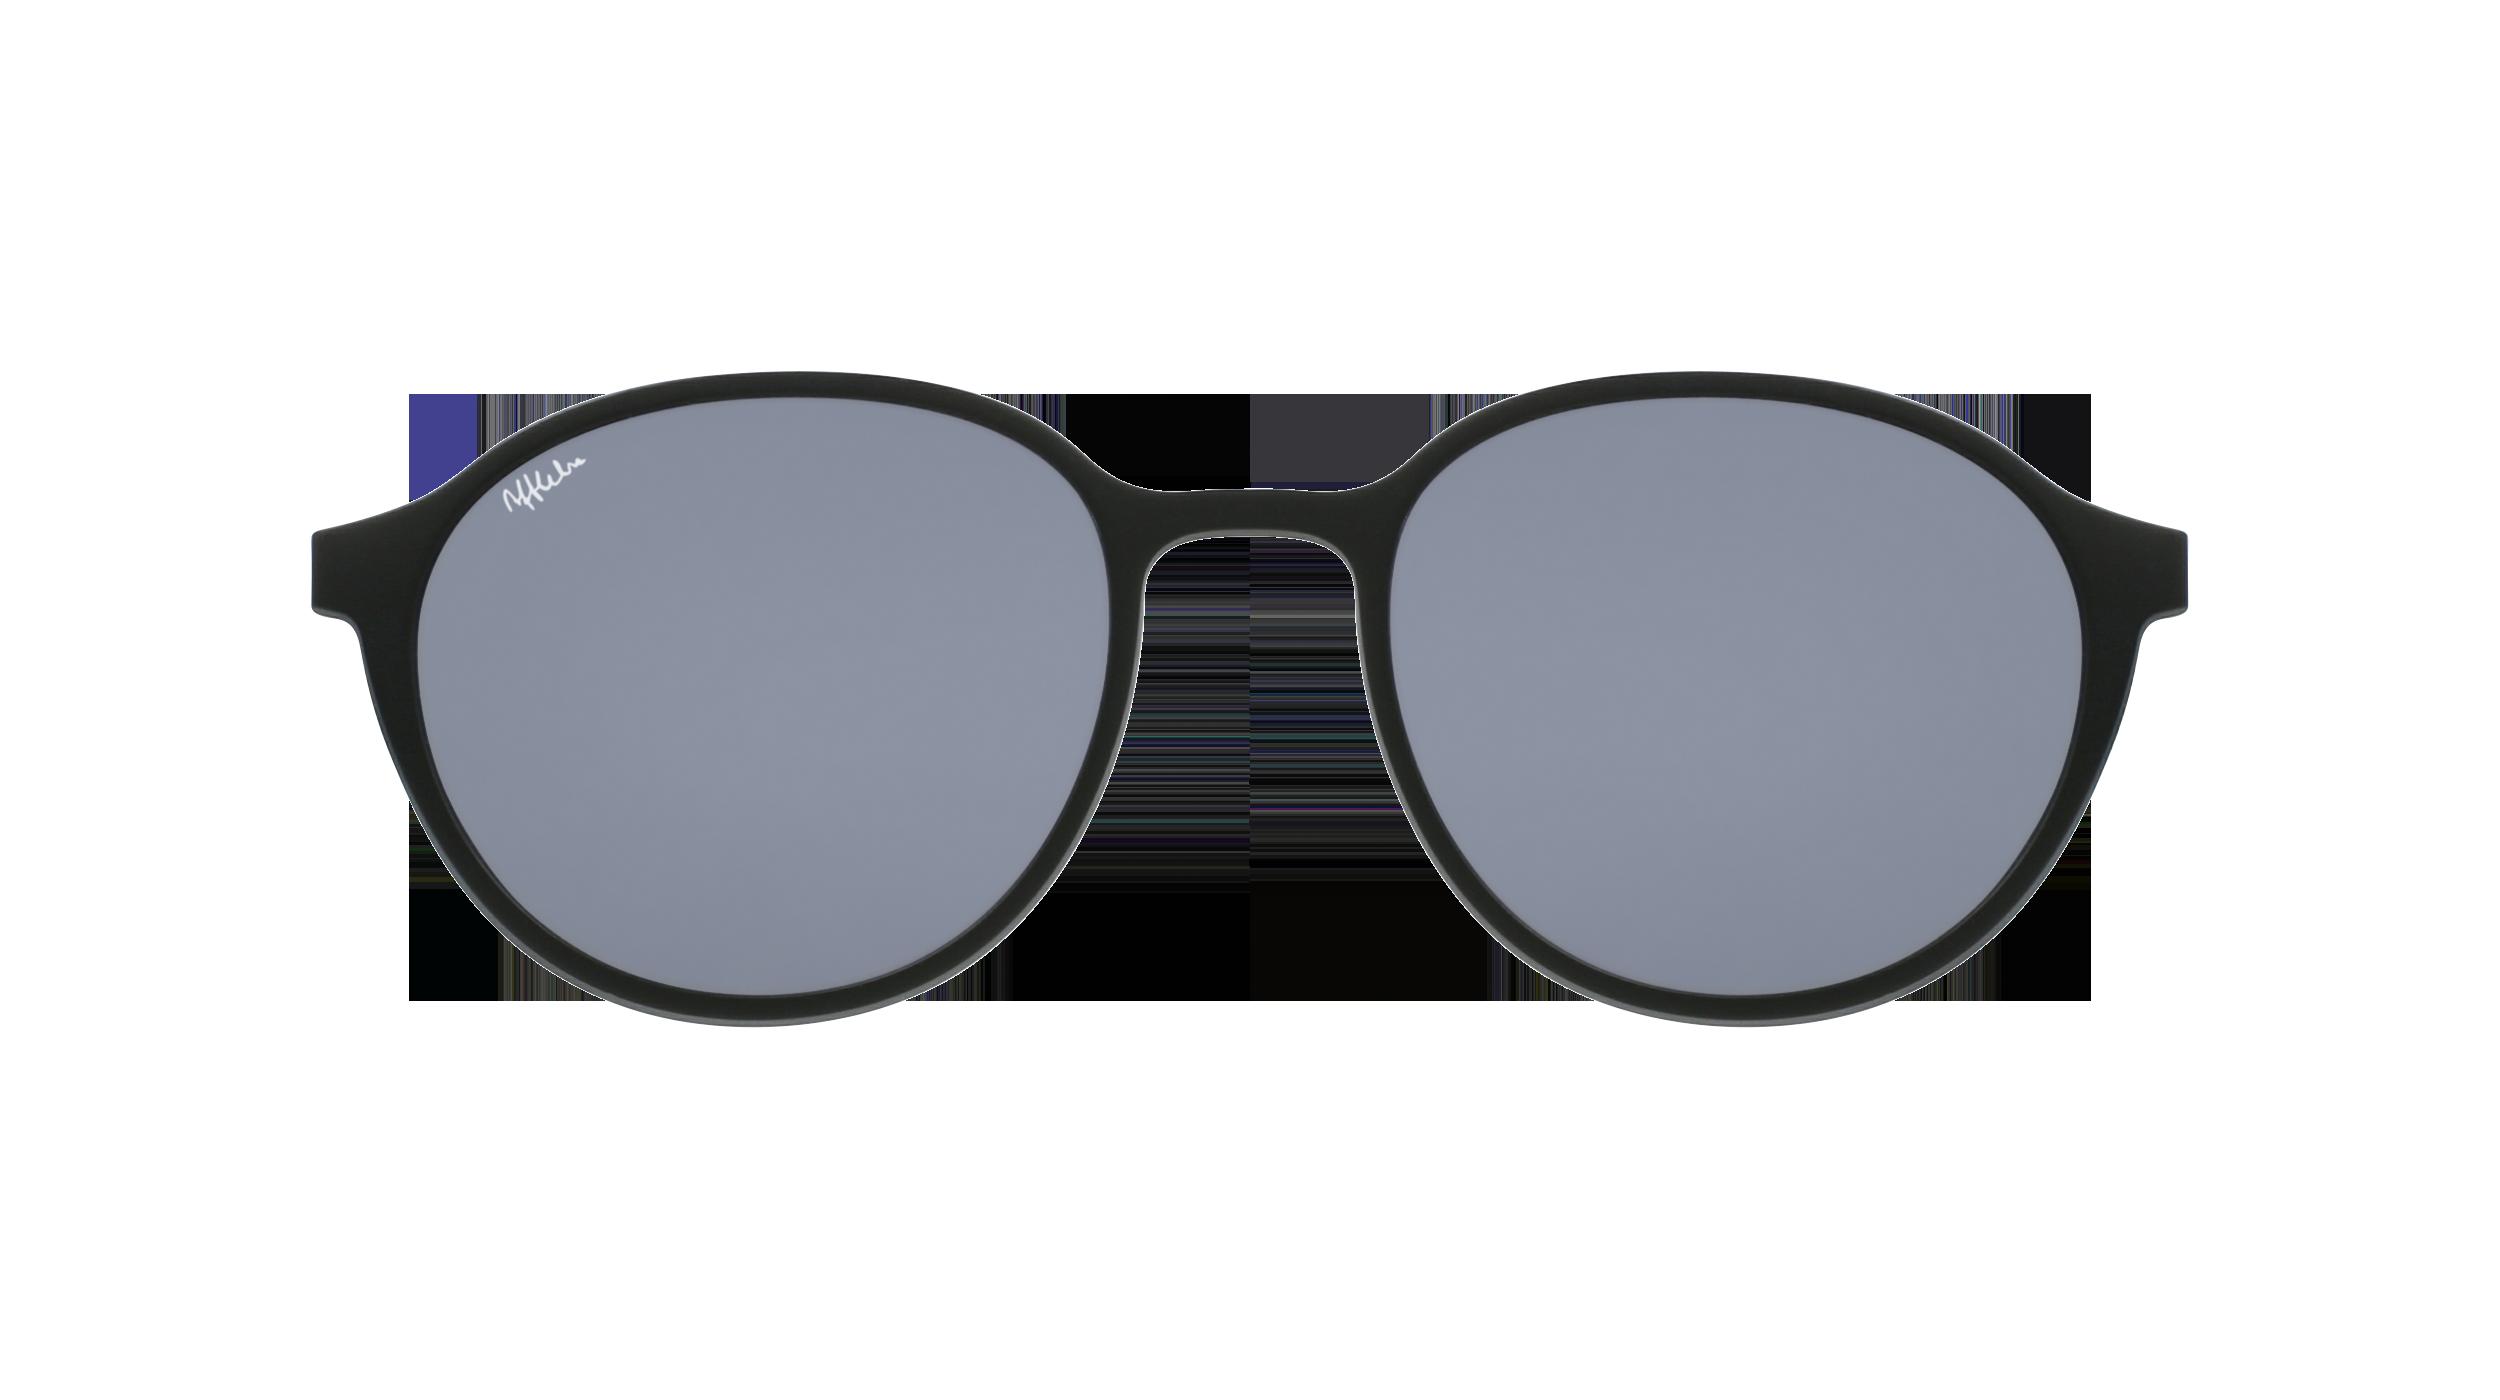 afflelou/france/products/smart_clip/clips_glasses/07630036458785.png